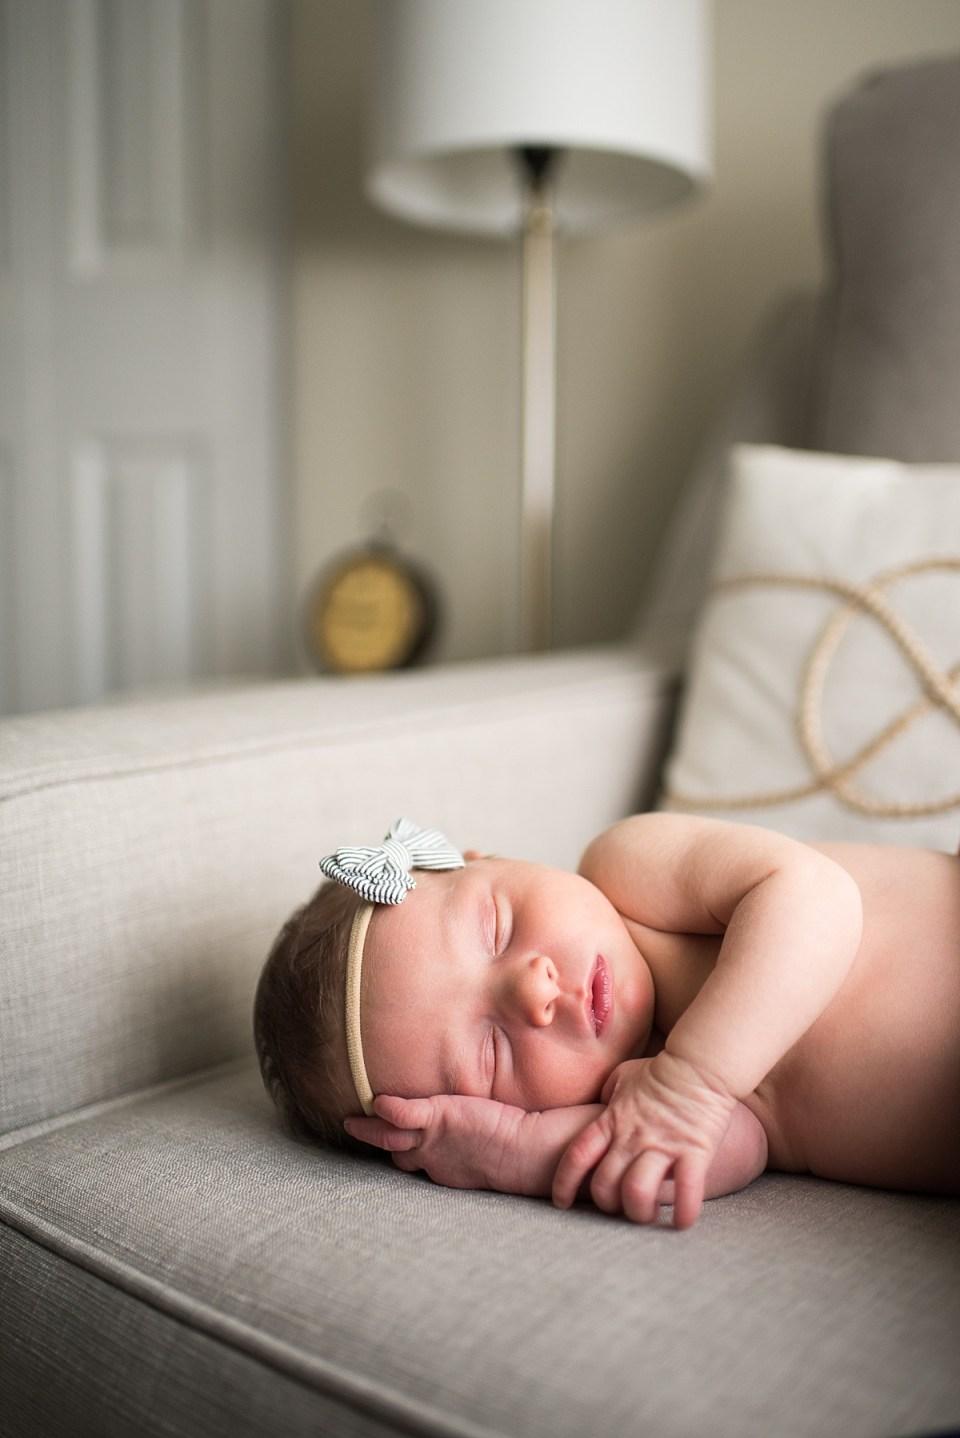 Newborn Photograph by Erin Tetterton Photography